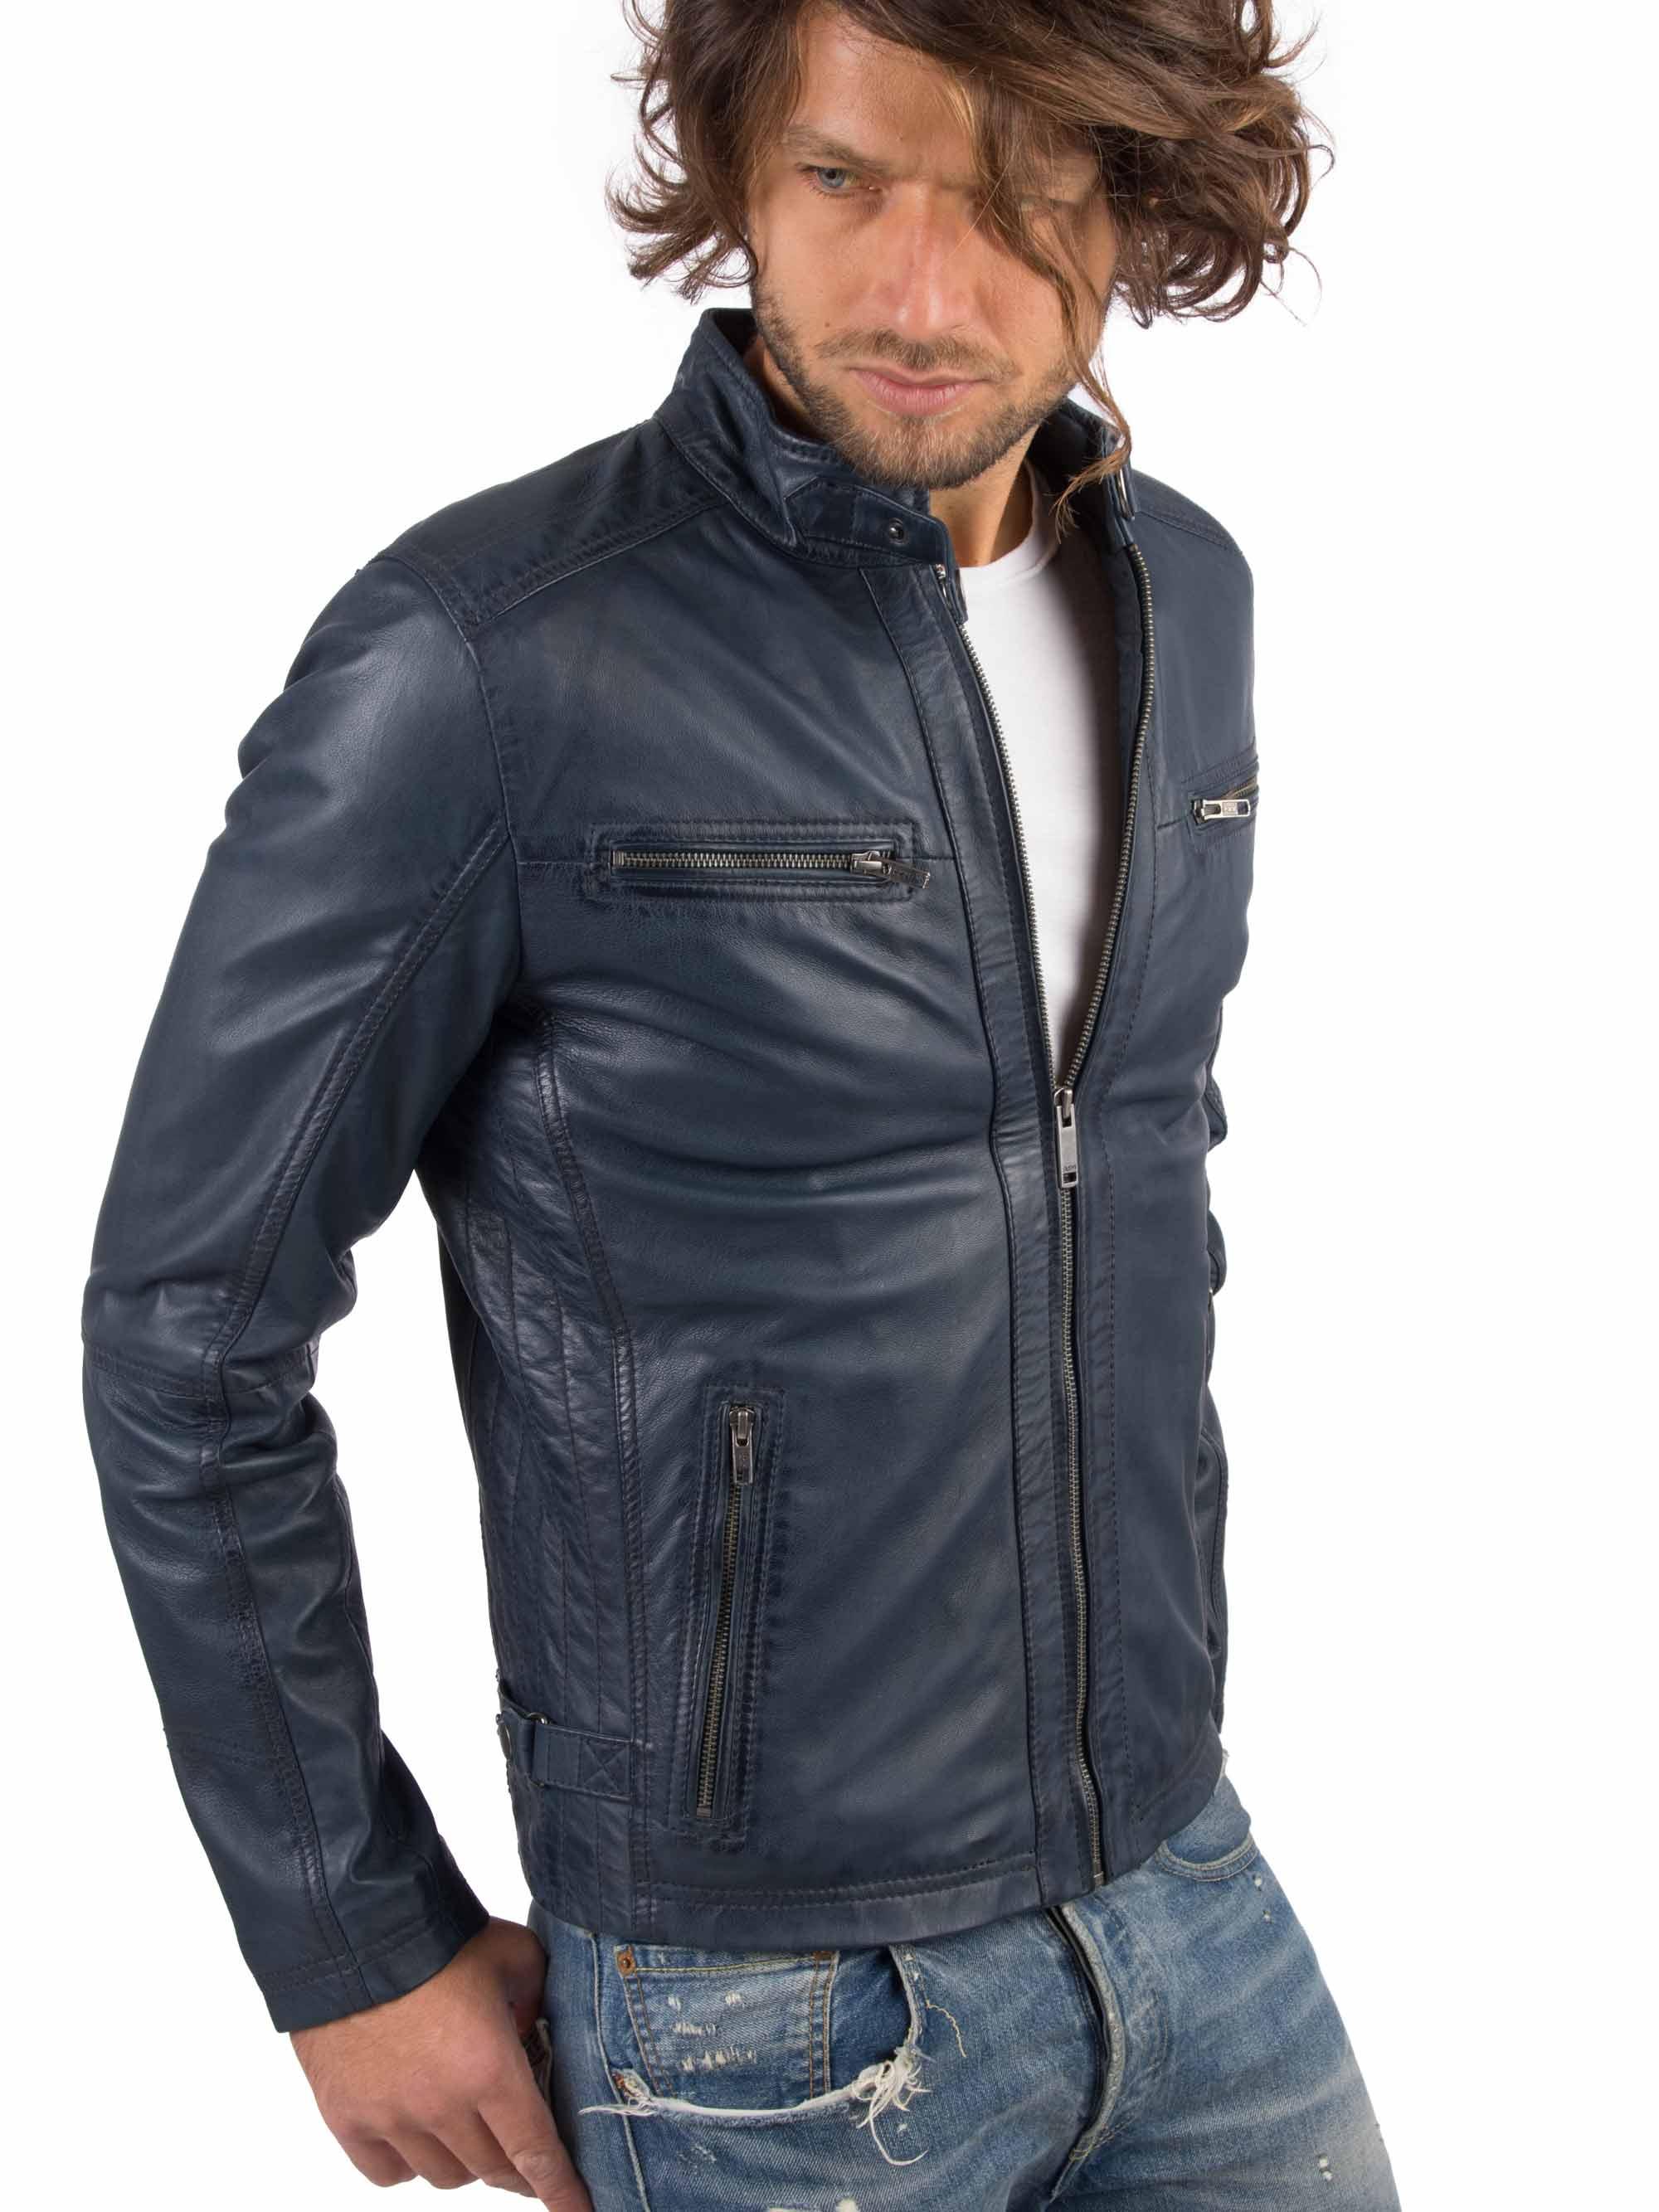 H9ba75ee62c794512a7792c0bb8e85f77M VAINAS European Brand Mens Genuine Leather jacket for men Winter Real sheep leather jacket Motorcycle jackets Biker jackets Alfa